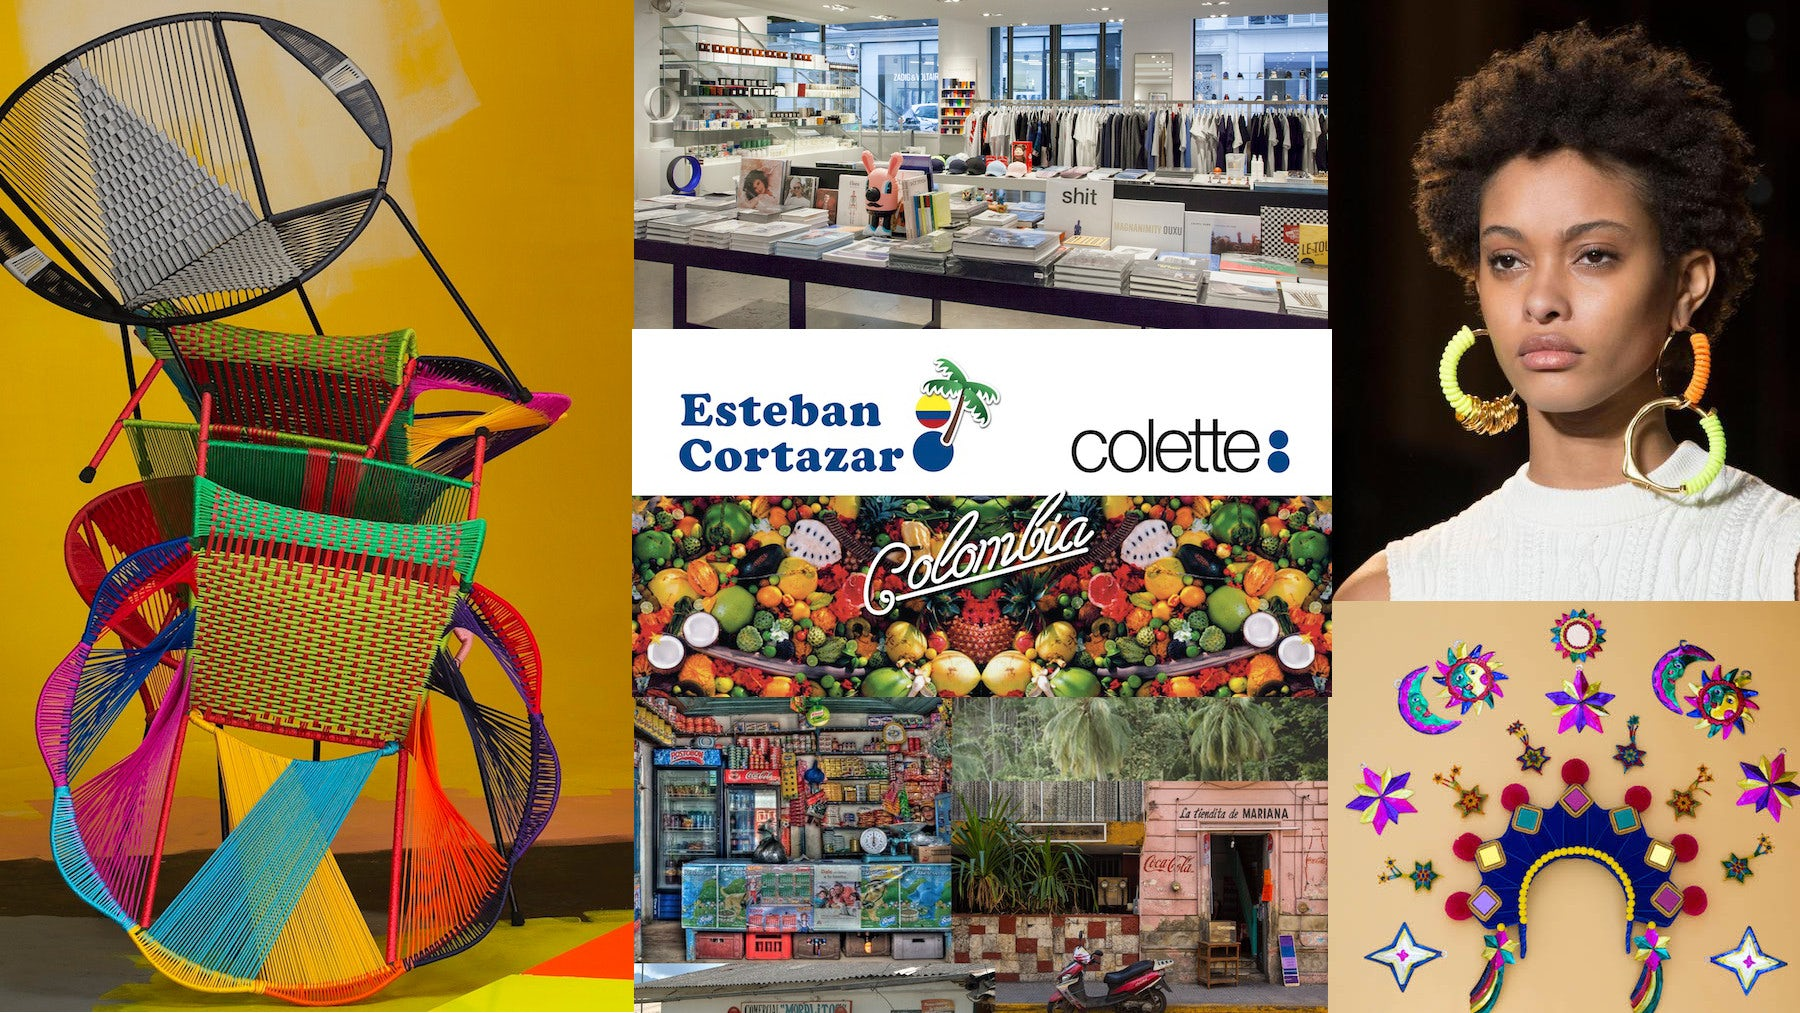 News Bites | Colette Celebrates Colombia, Renzo Rosso Buys Stake in RetroSuperFuture